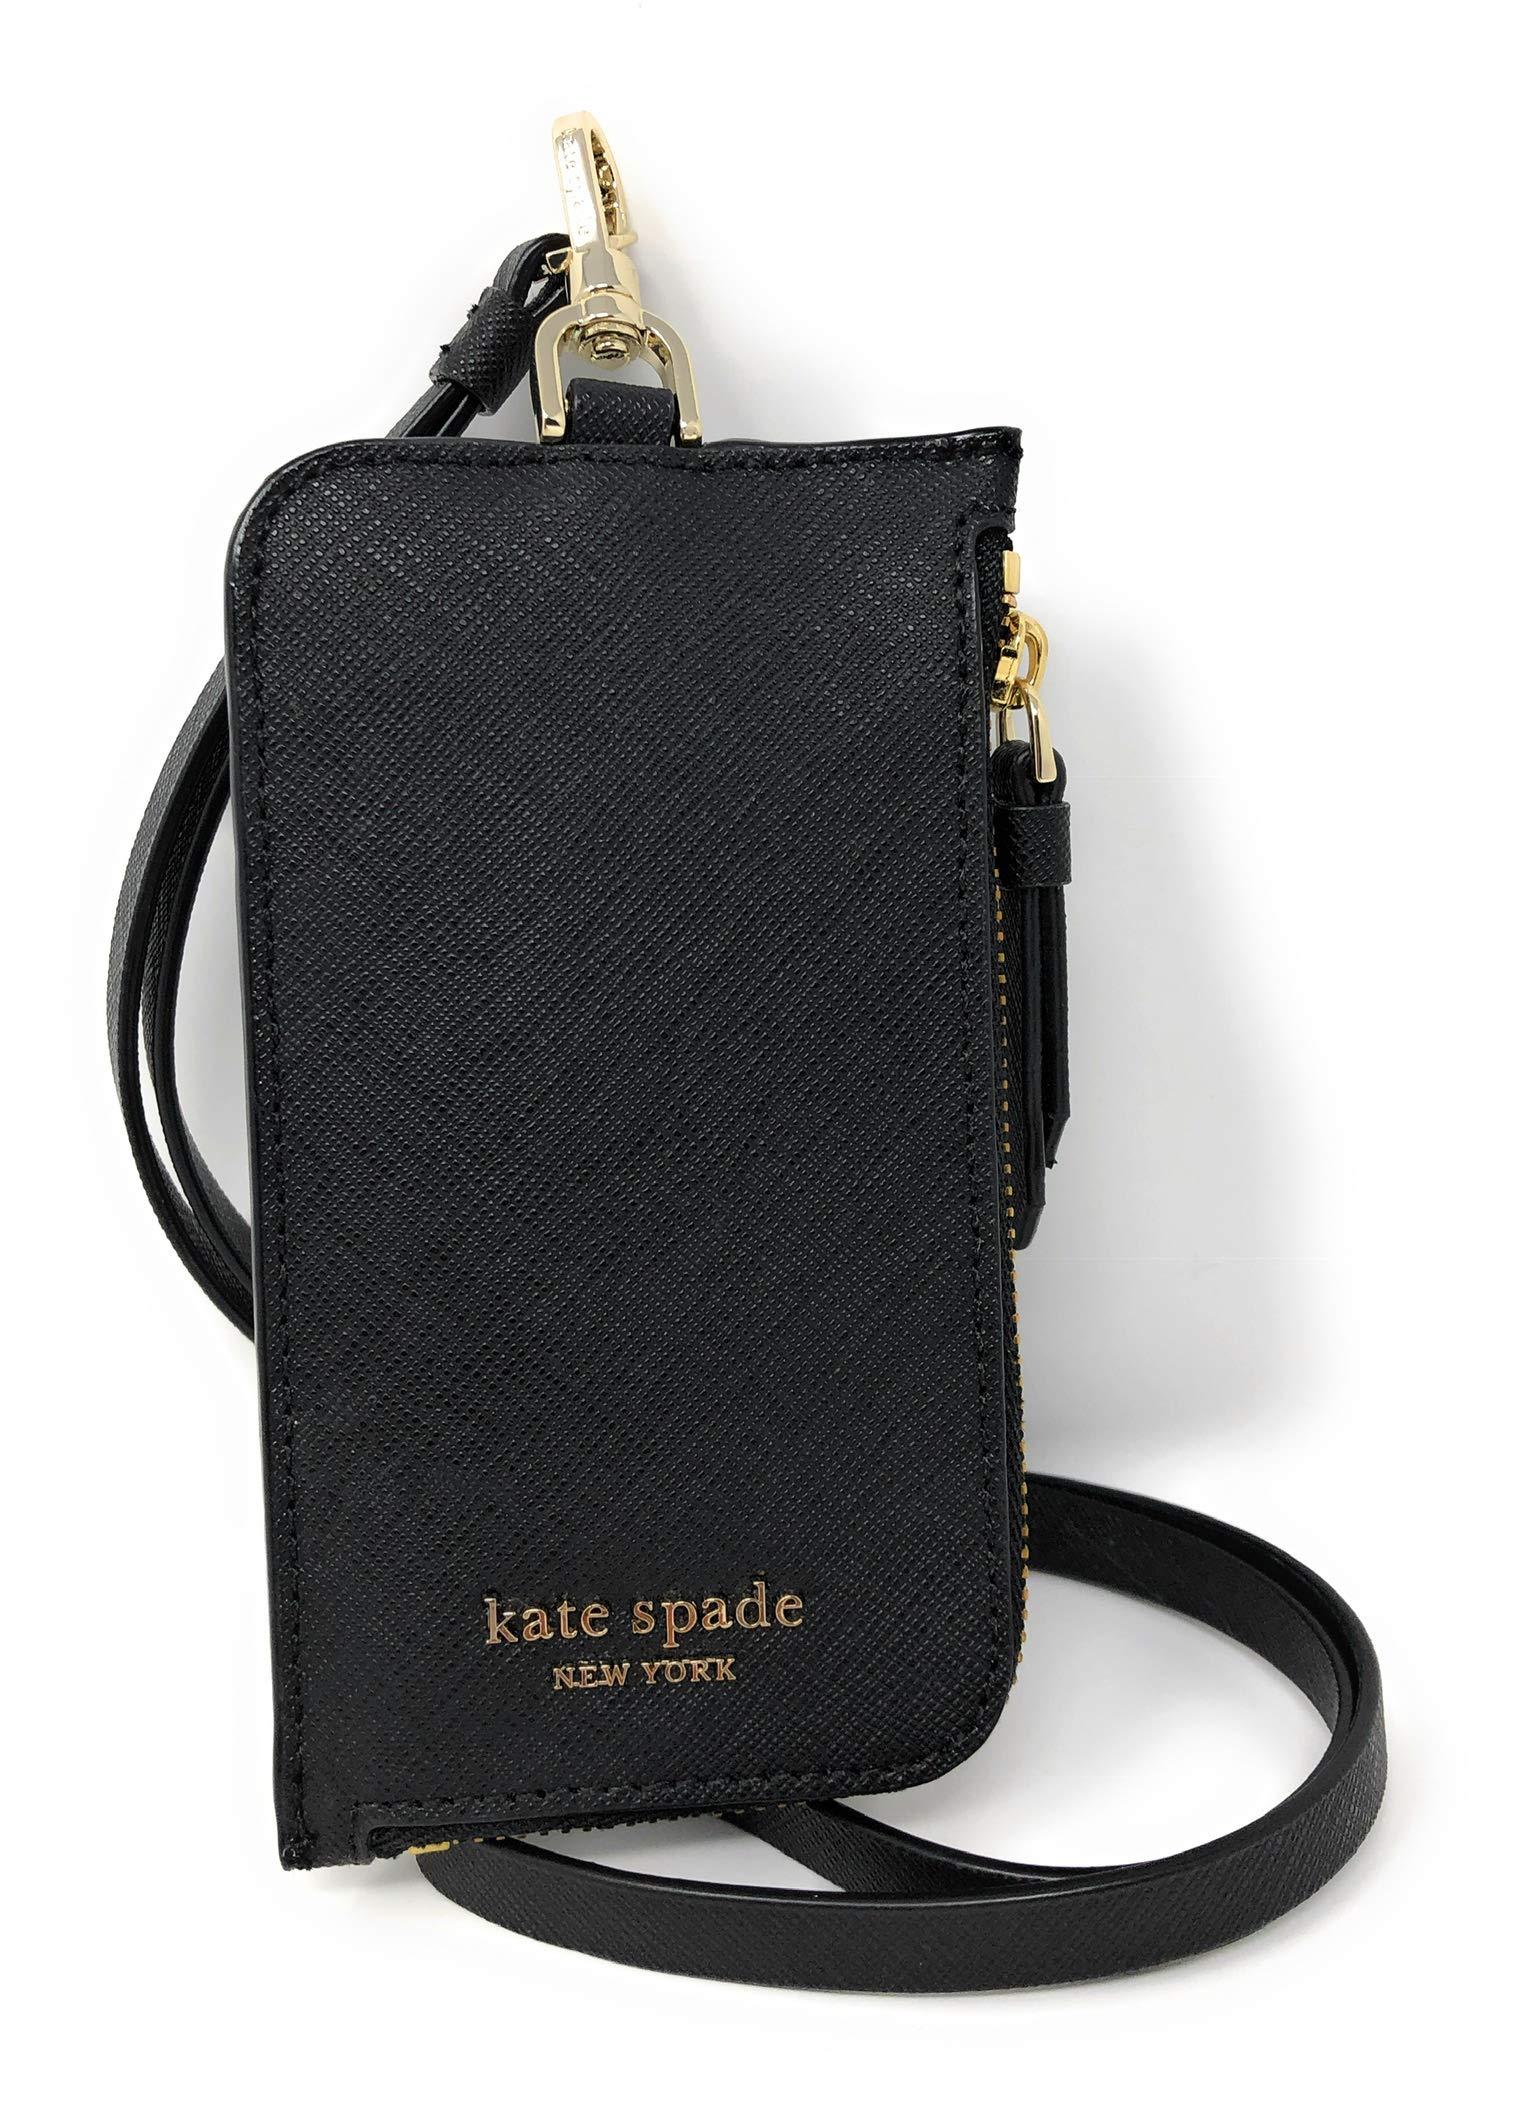 Kate Spade New York L-Zip Saffiano Leather Card Case Lanyard Black